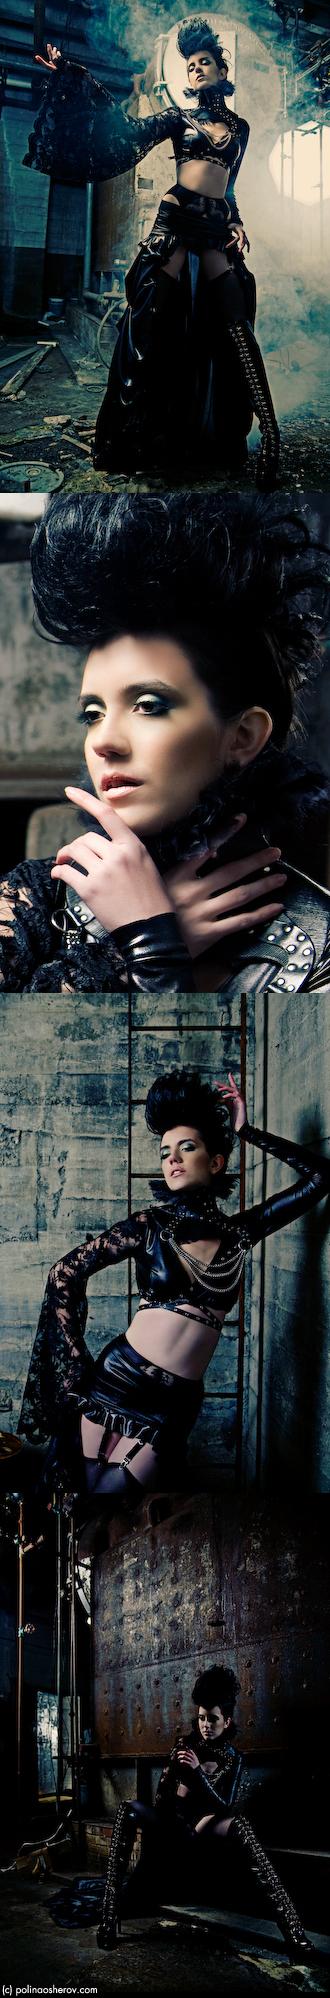 Indianapolis, IN Apr 03, 2010 polina osherov Photography Hair: Irina Green; Clothing: Apgar